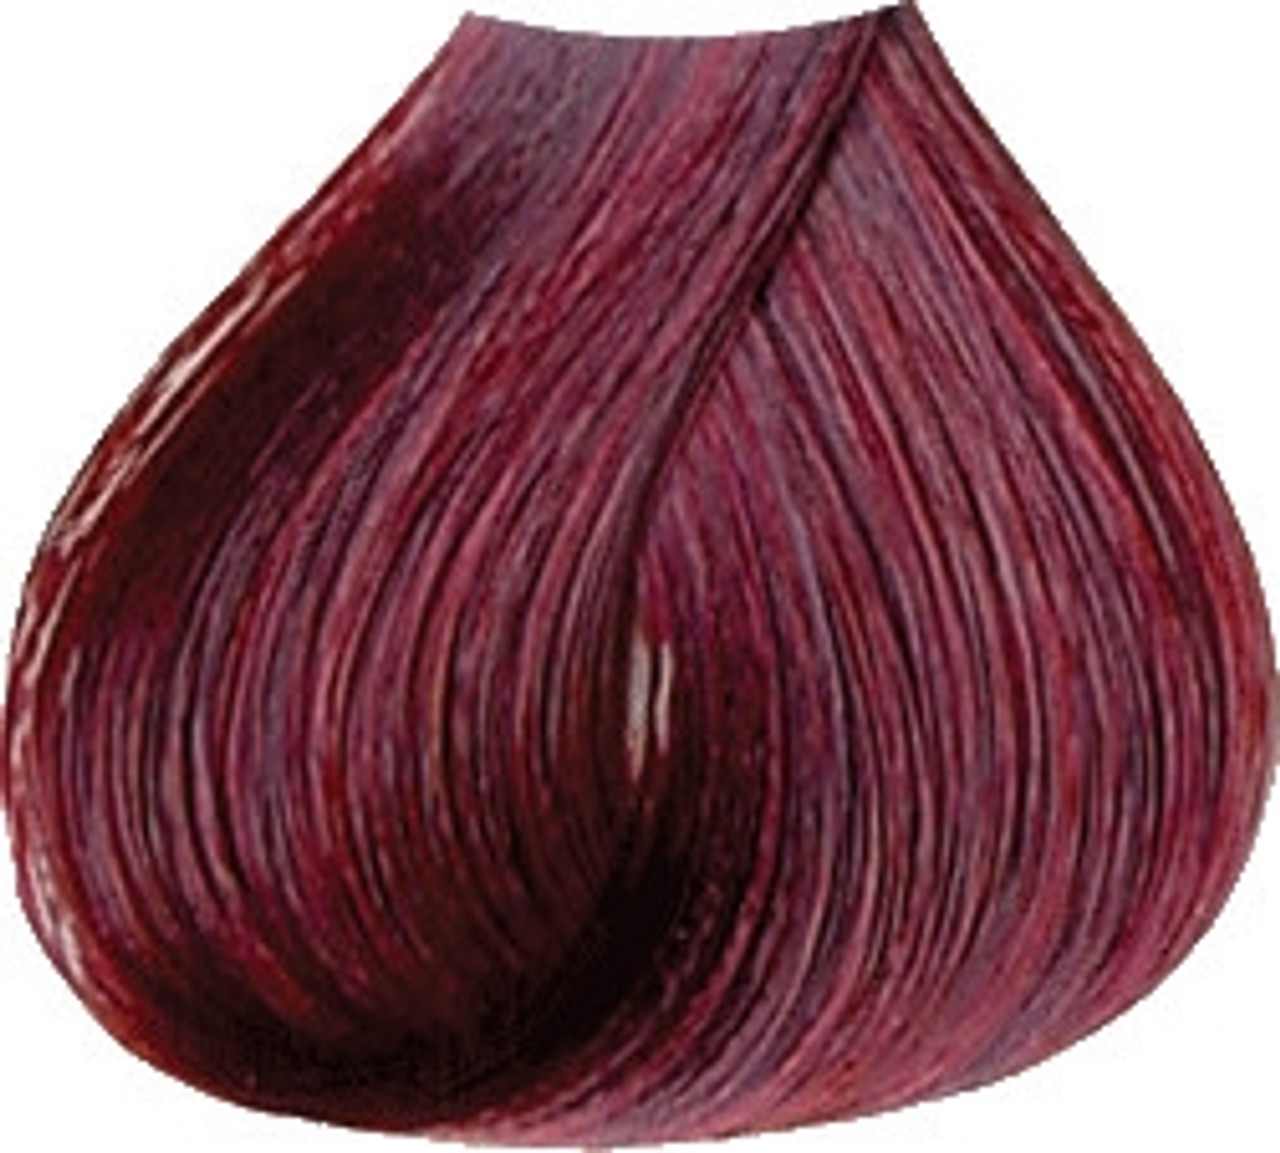 Satin Hair Color - Red - 5R Light Brown Auburn